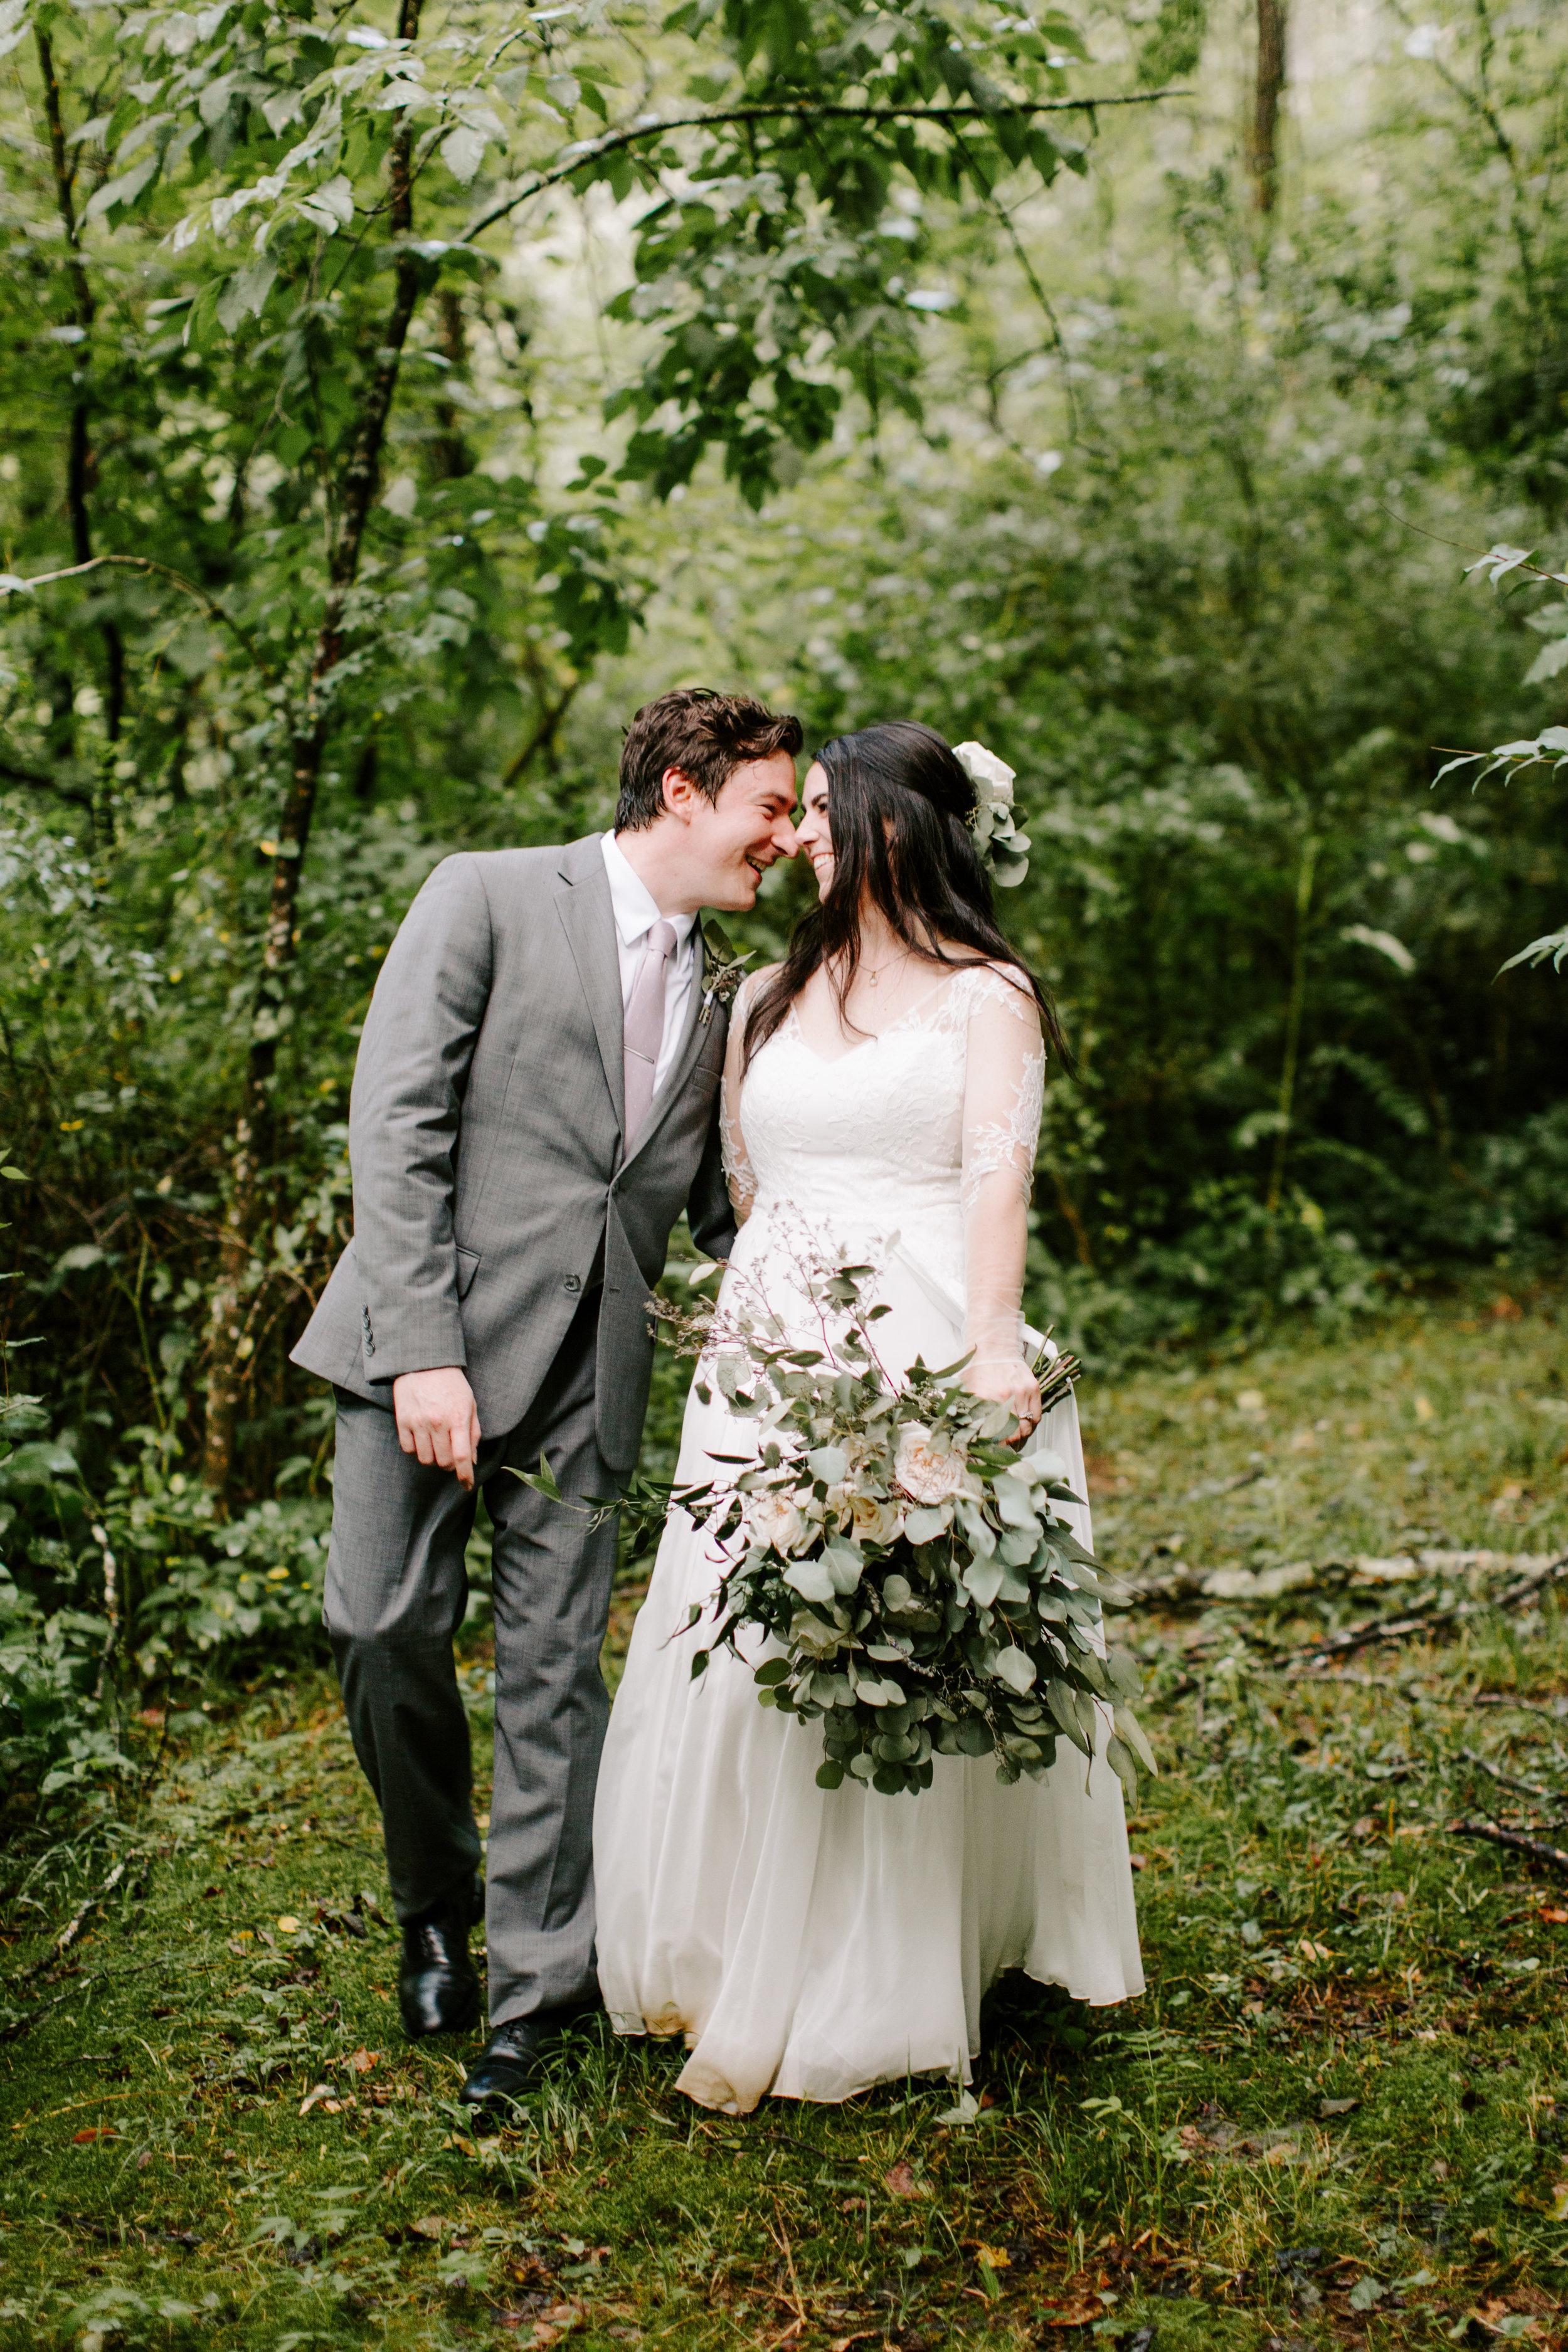 couple-walking-through-forest.jpg